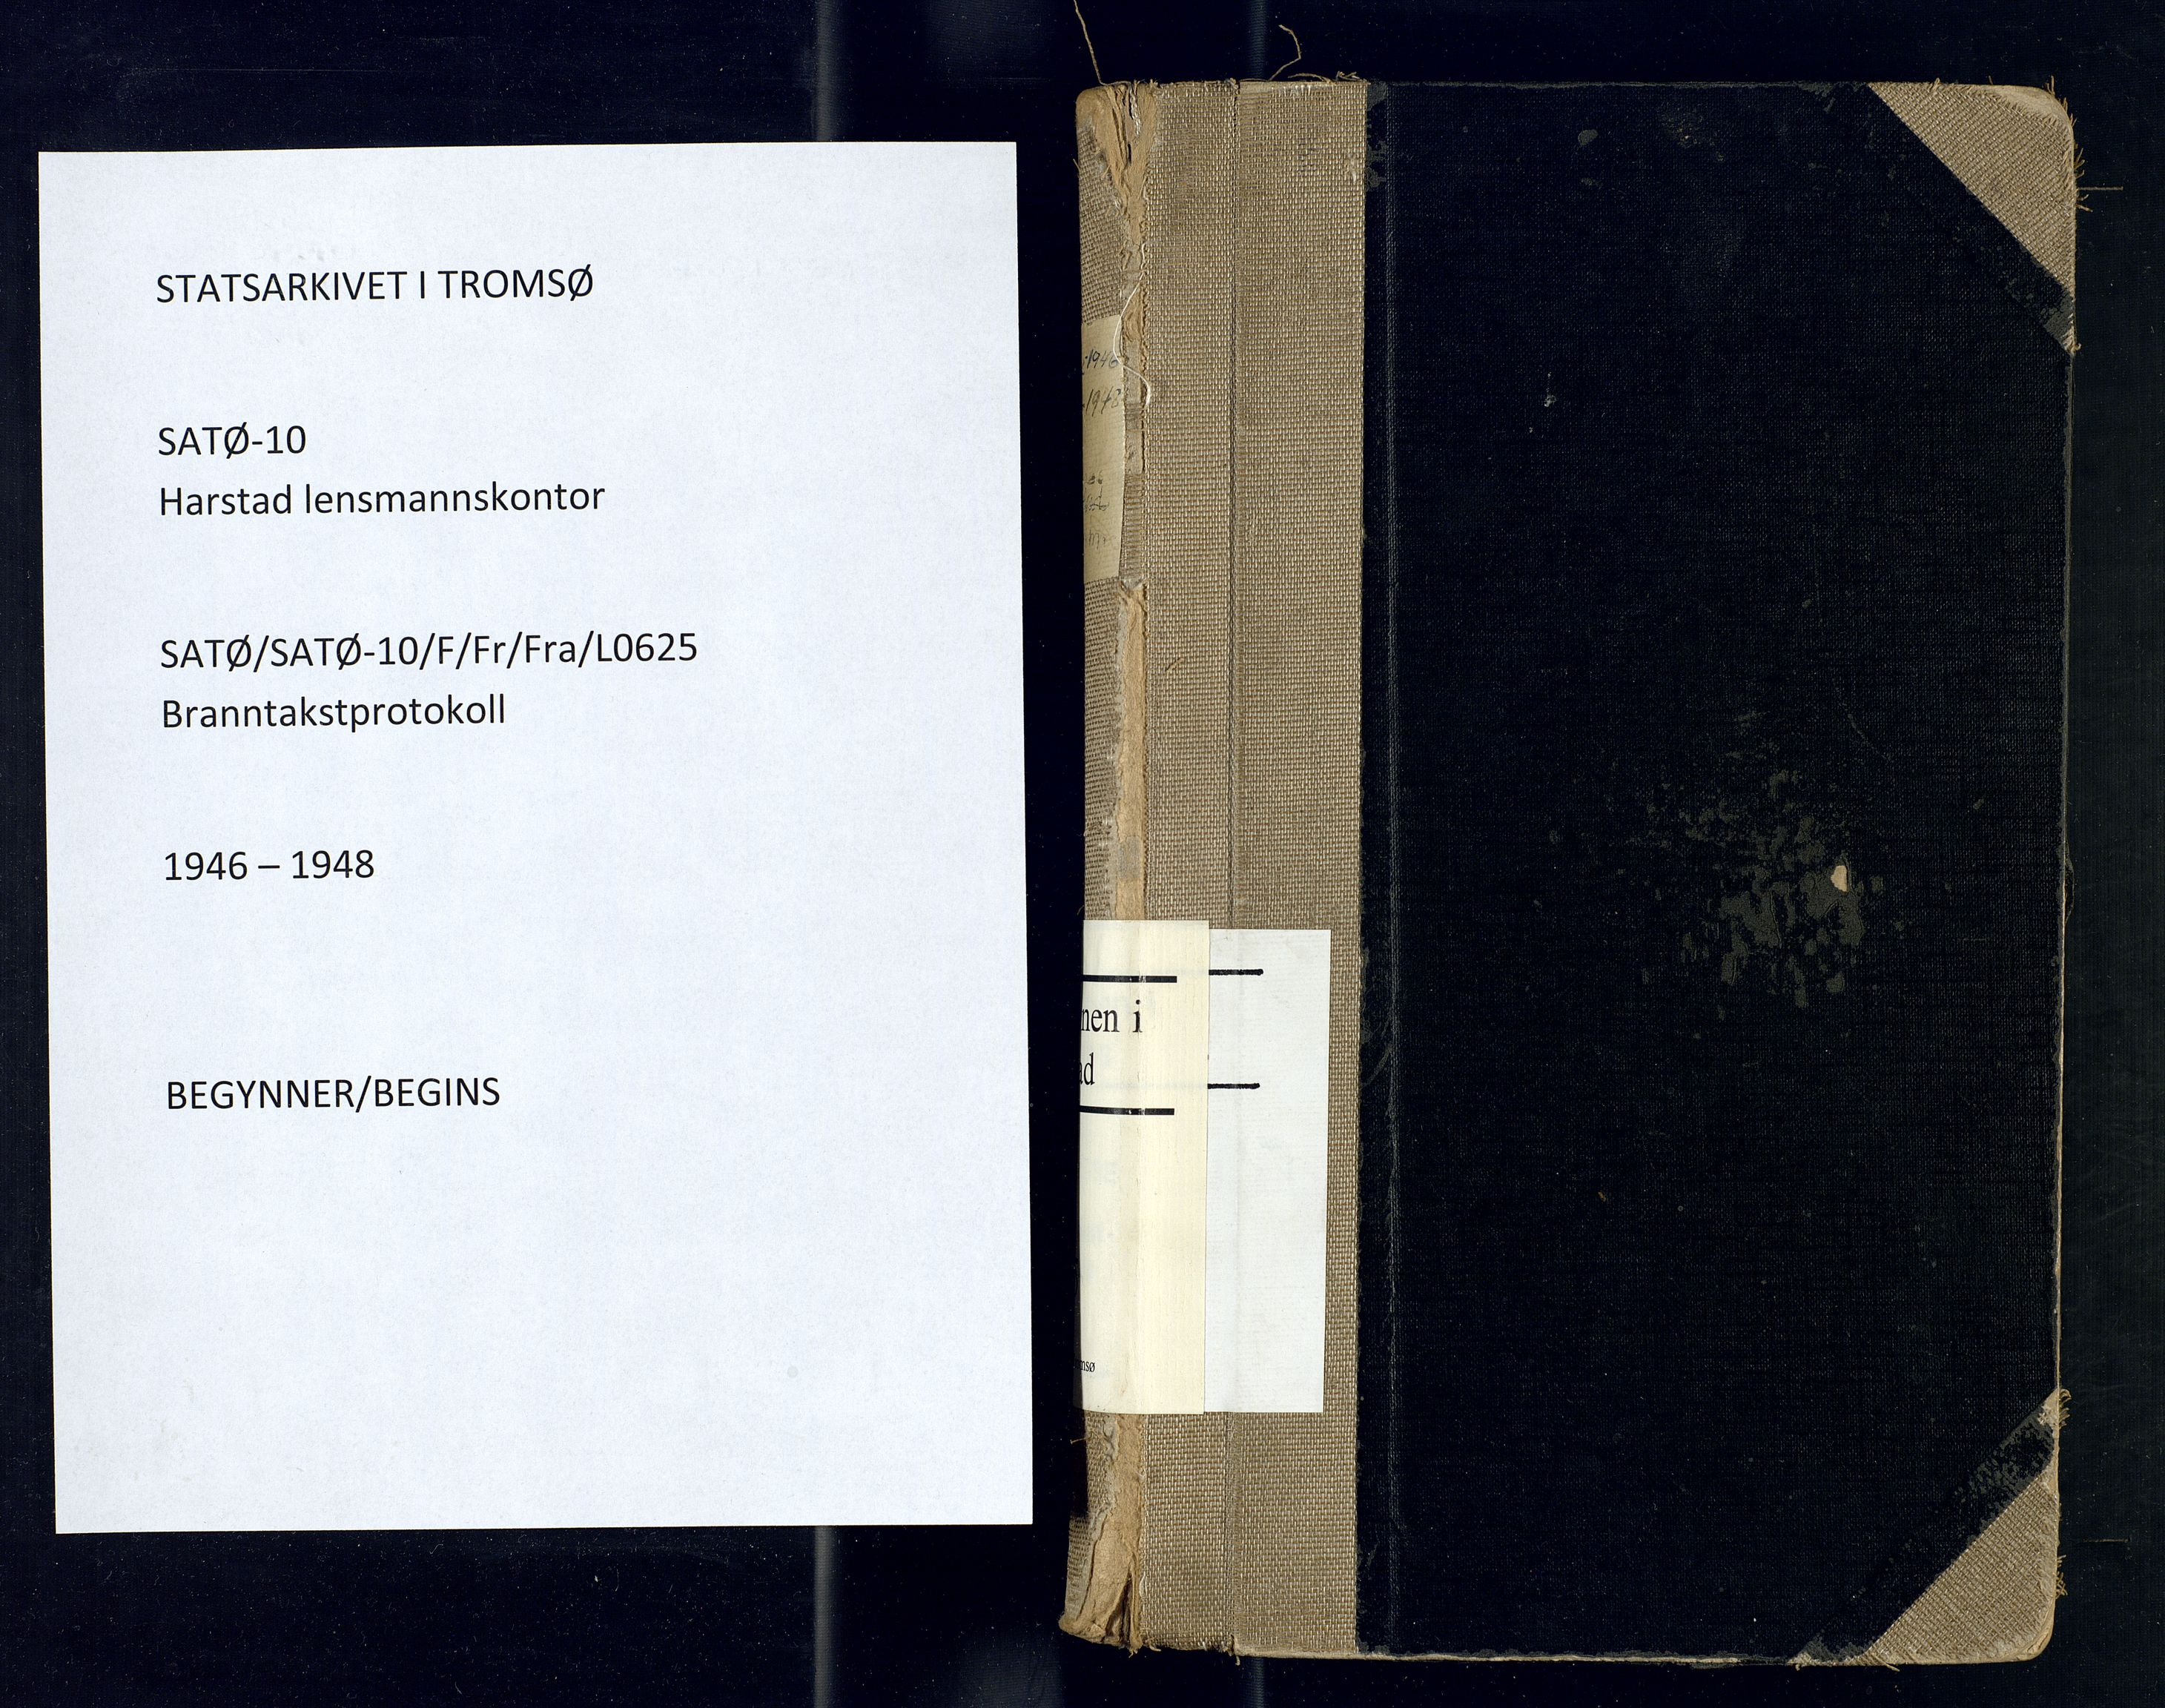 SATØ, Harstad lensmannskontor, F/Fr/Fra/L0625: Branntakstprotokoll, 1946-1948